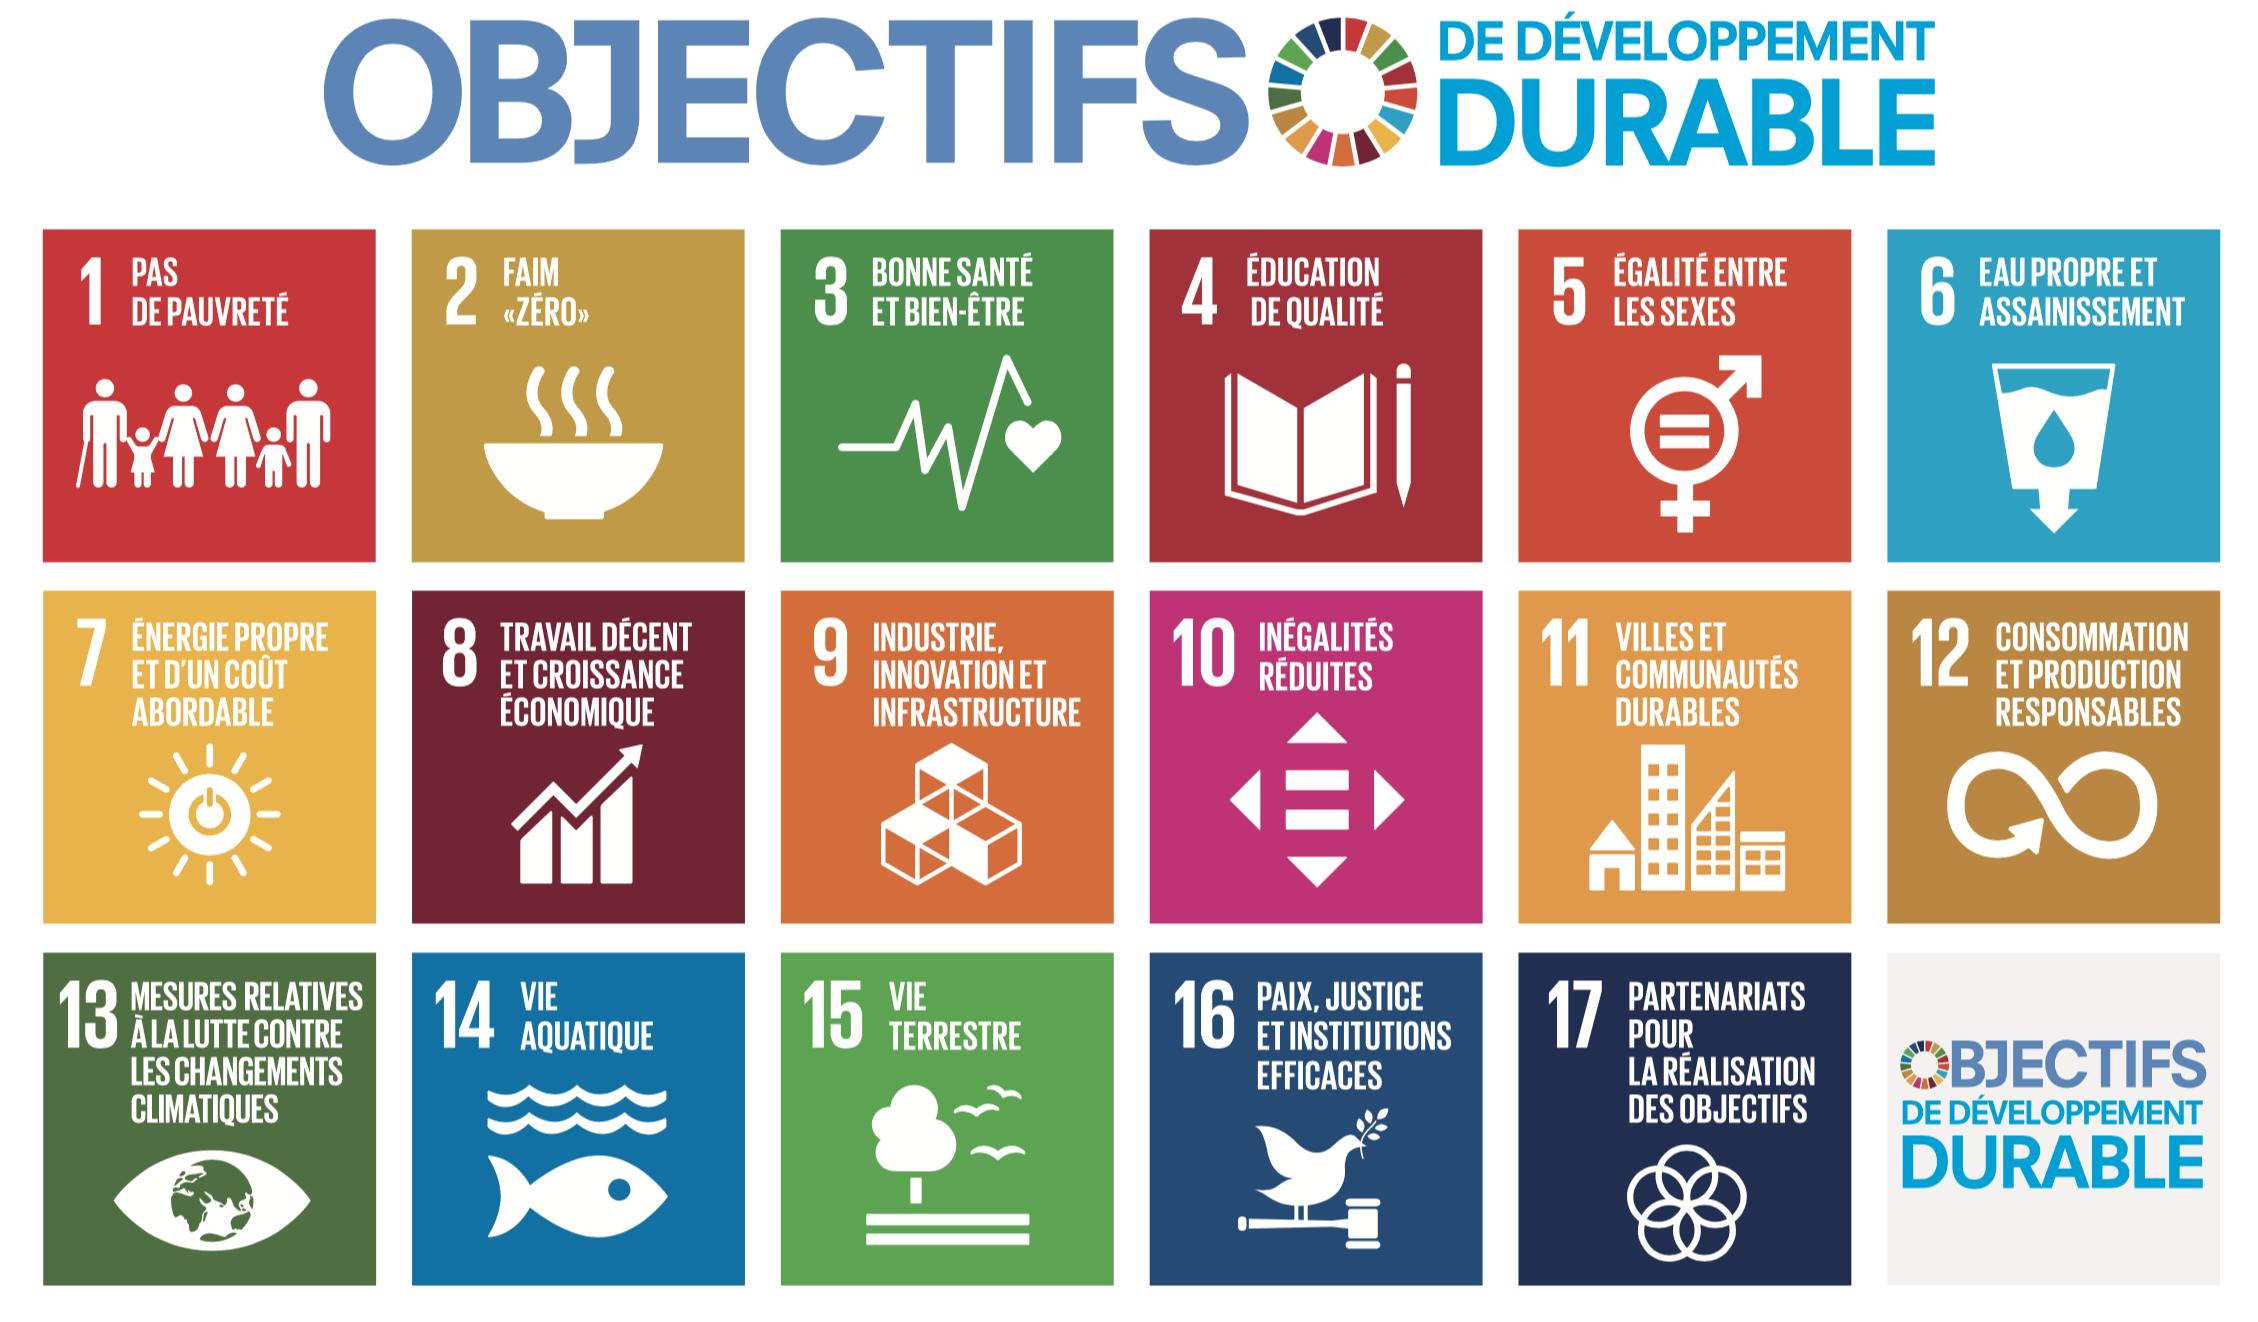 Choisir Gobi, c'est participer aux ODD de l'Agenda 2030